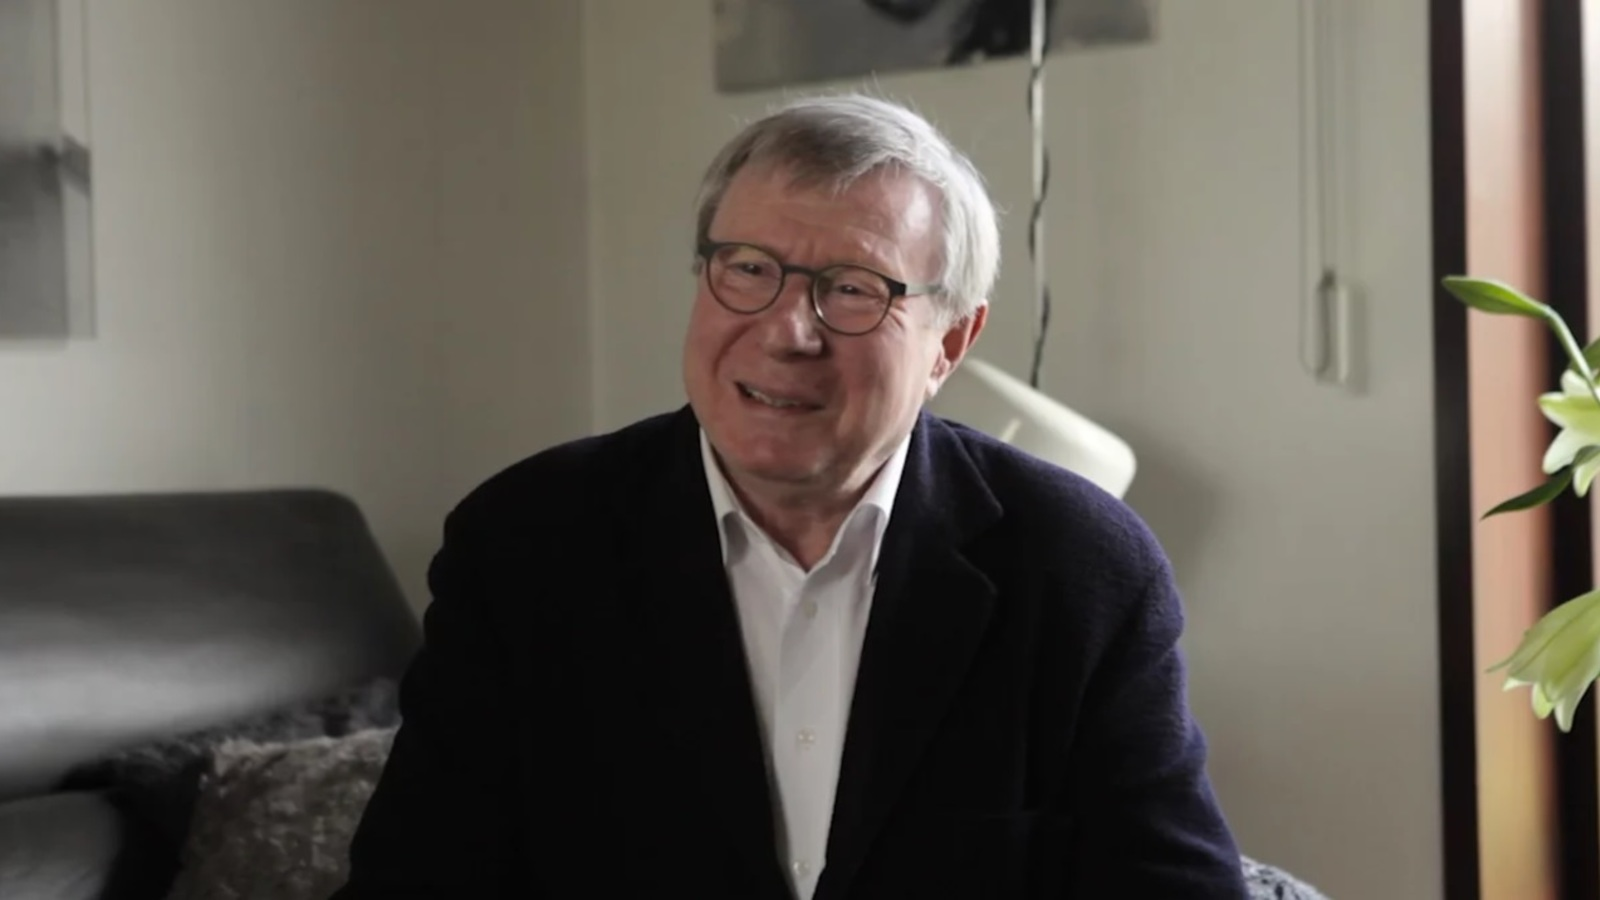 Wilfried Cooreman